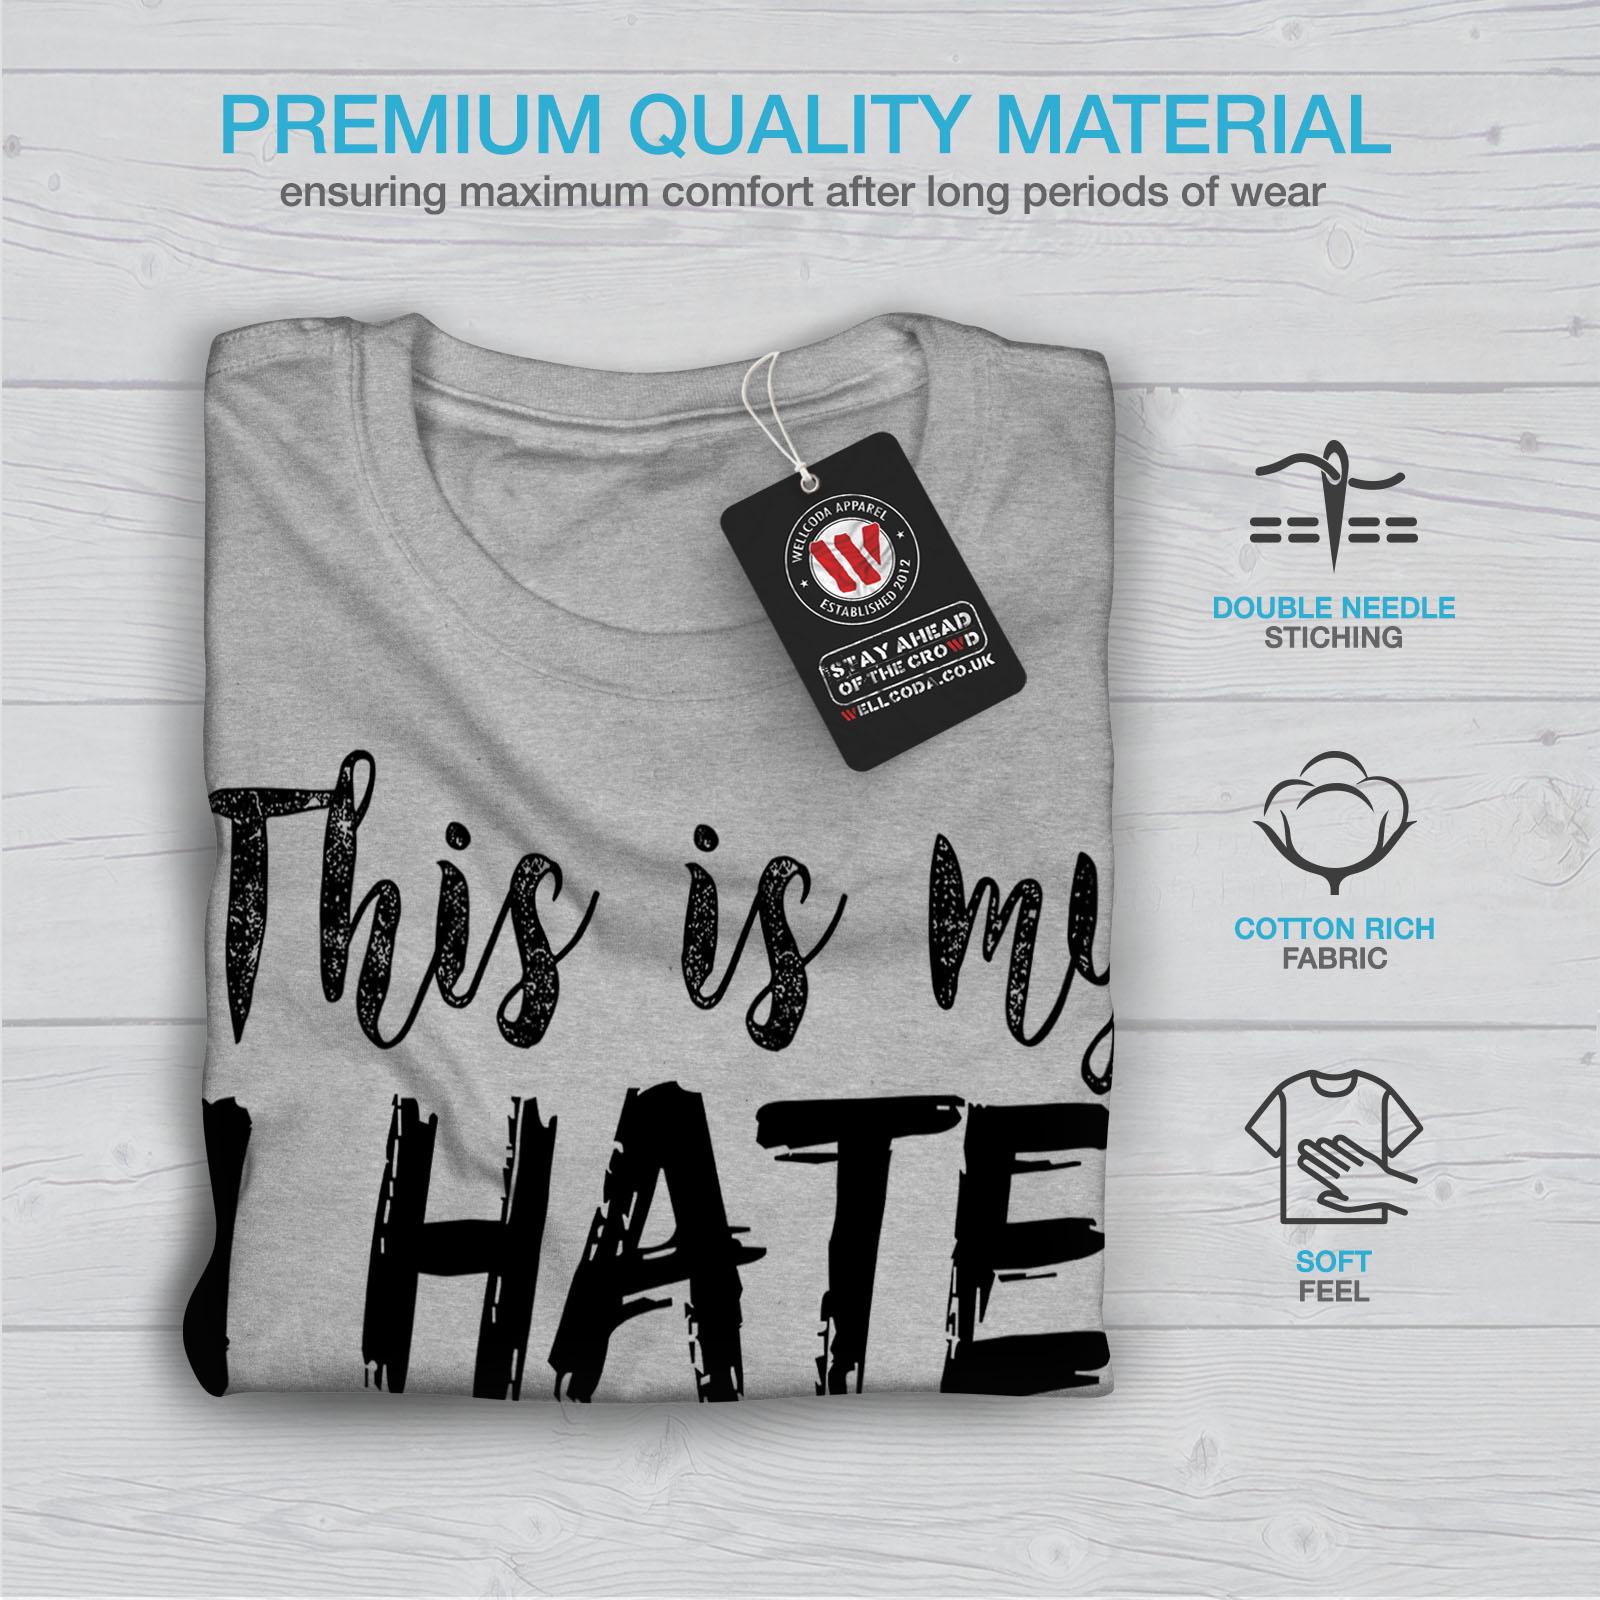 Wellcoda-hasse-alle-heute-Herren-T-Shirt-lustige-Grafikdesign-Printed-Tee Indexbild 19